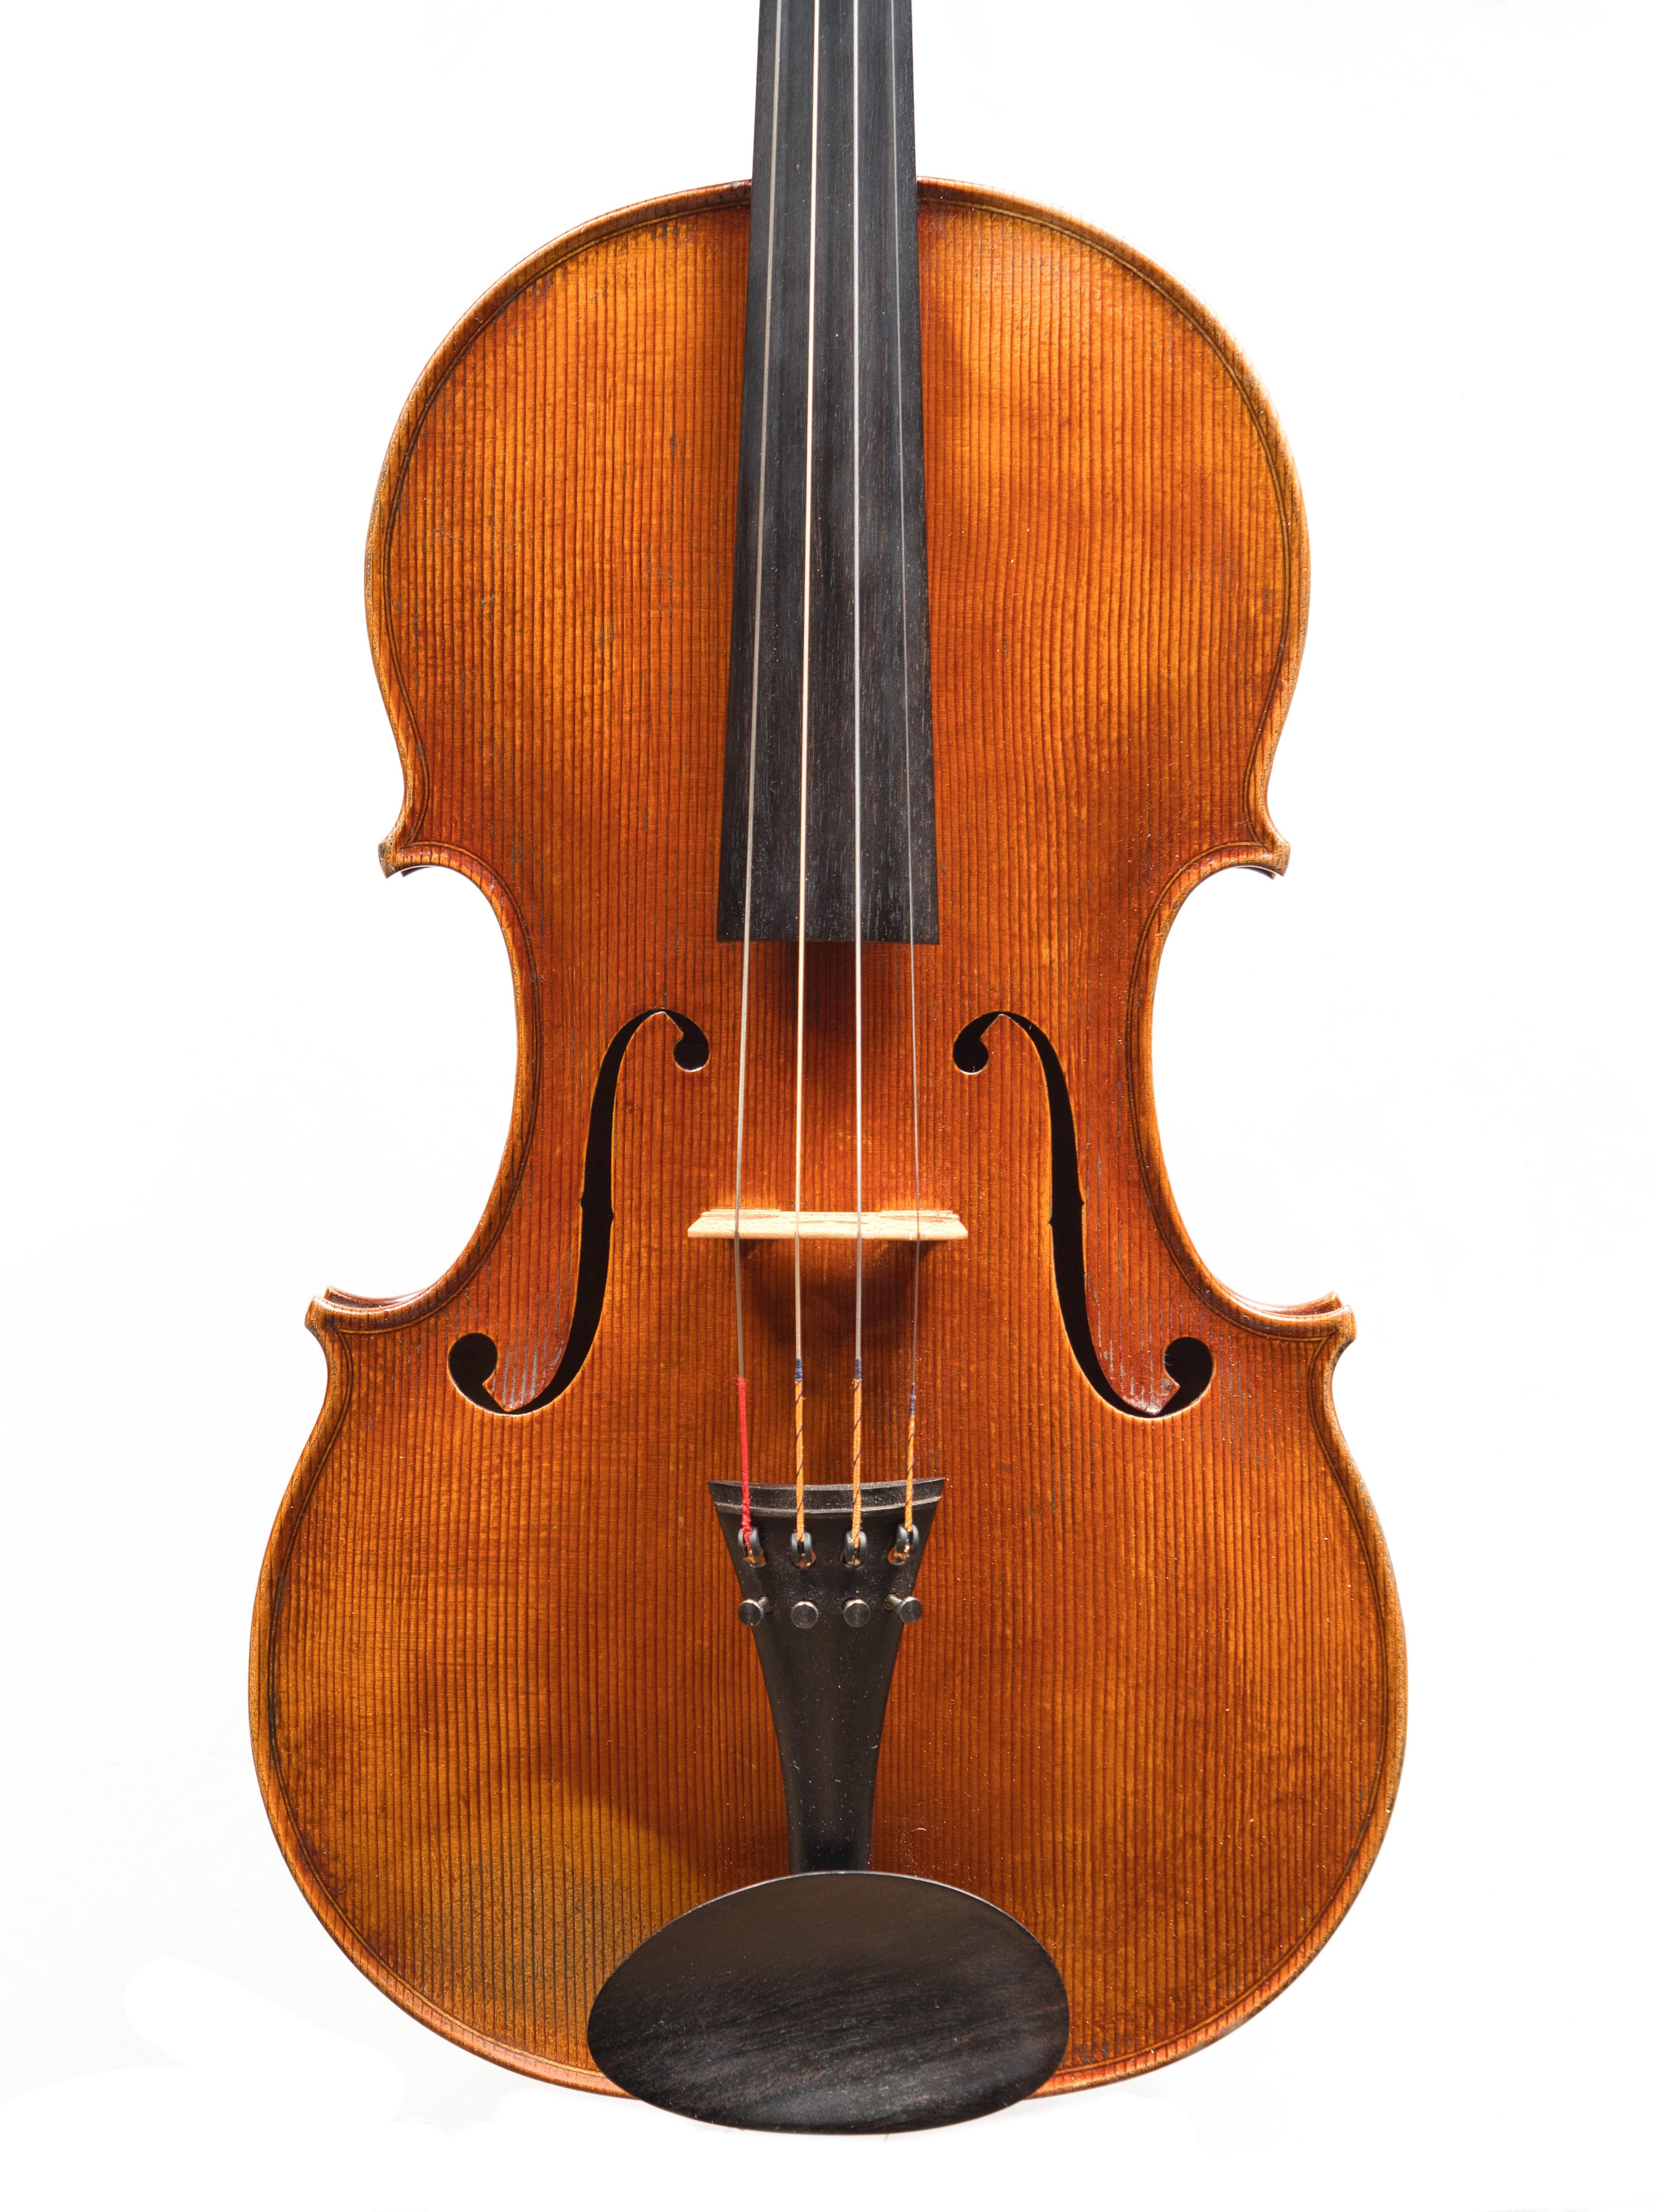 Viola by Benoit Bonten, 2019